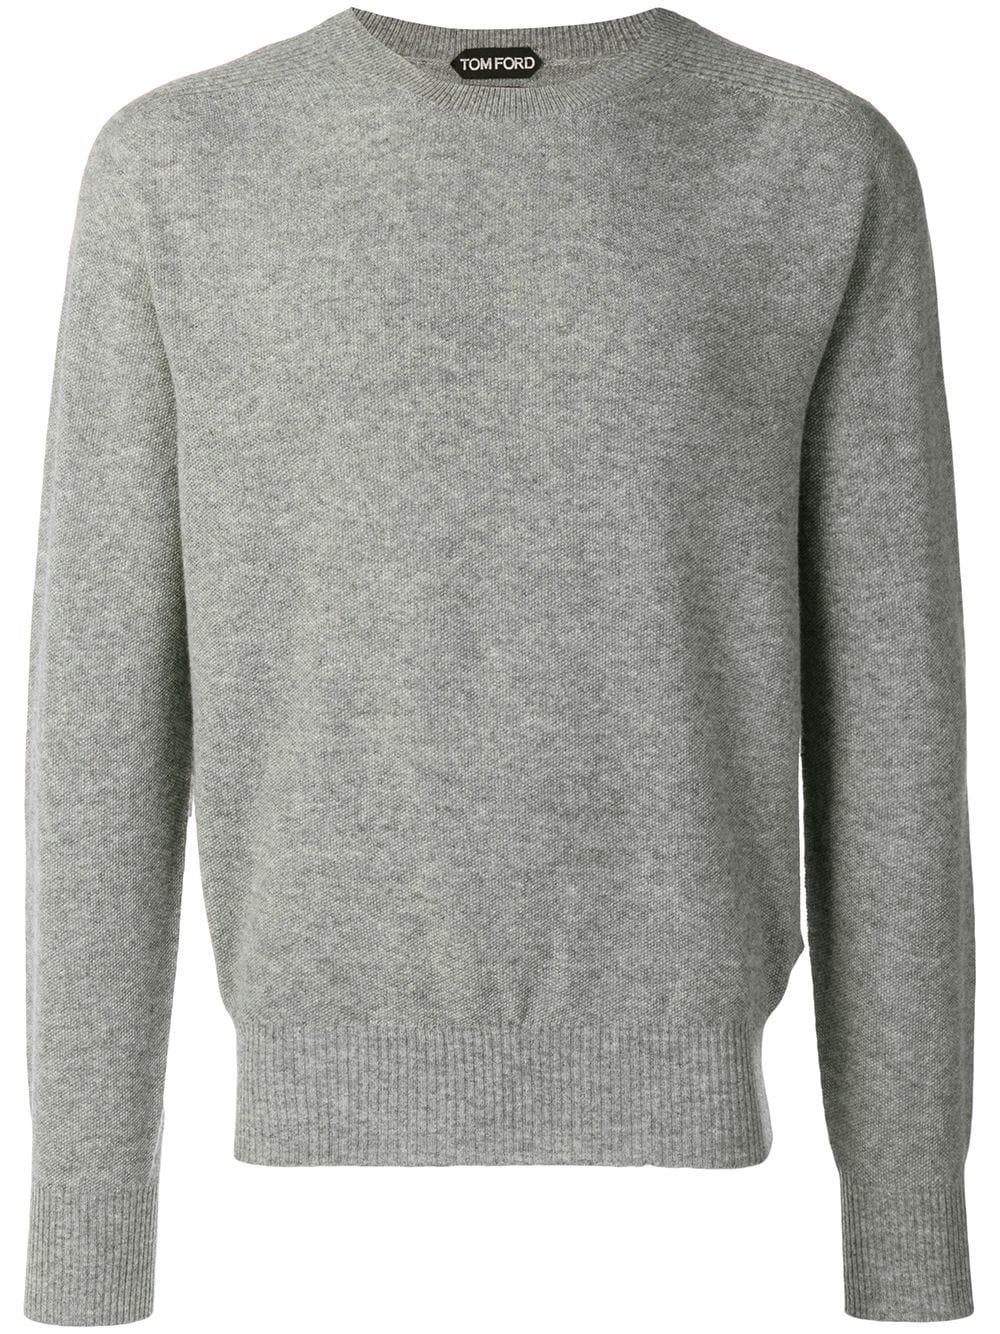 tom ford pullover mit rundem ausschnitt grau in grey. Black Bedroom Furniture Sets. Home Design Ideas